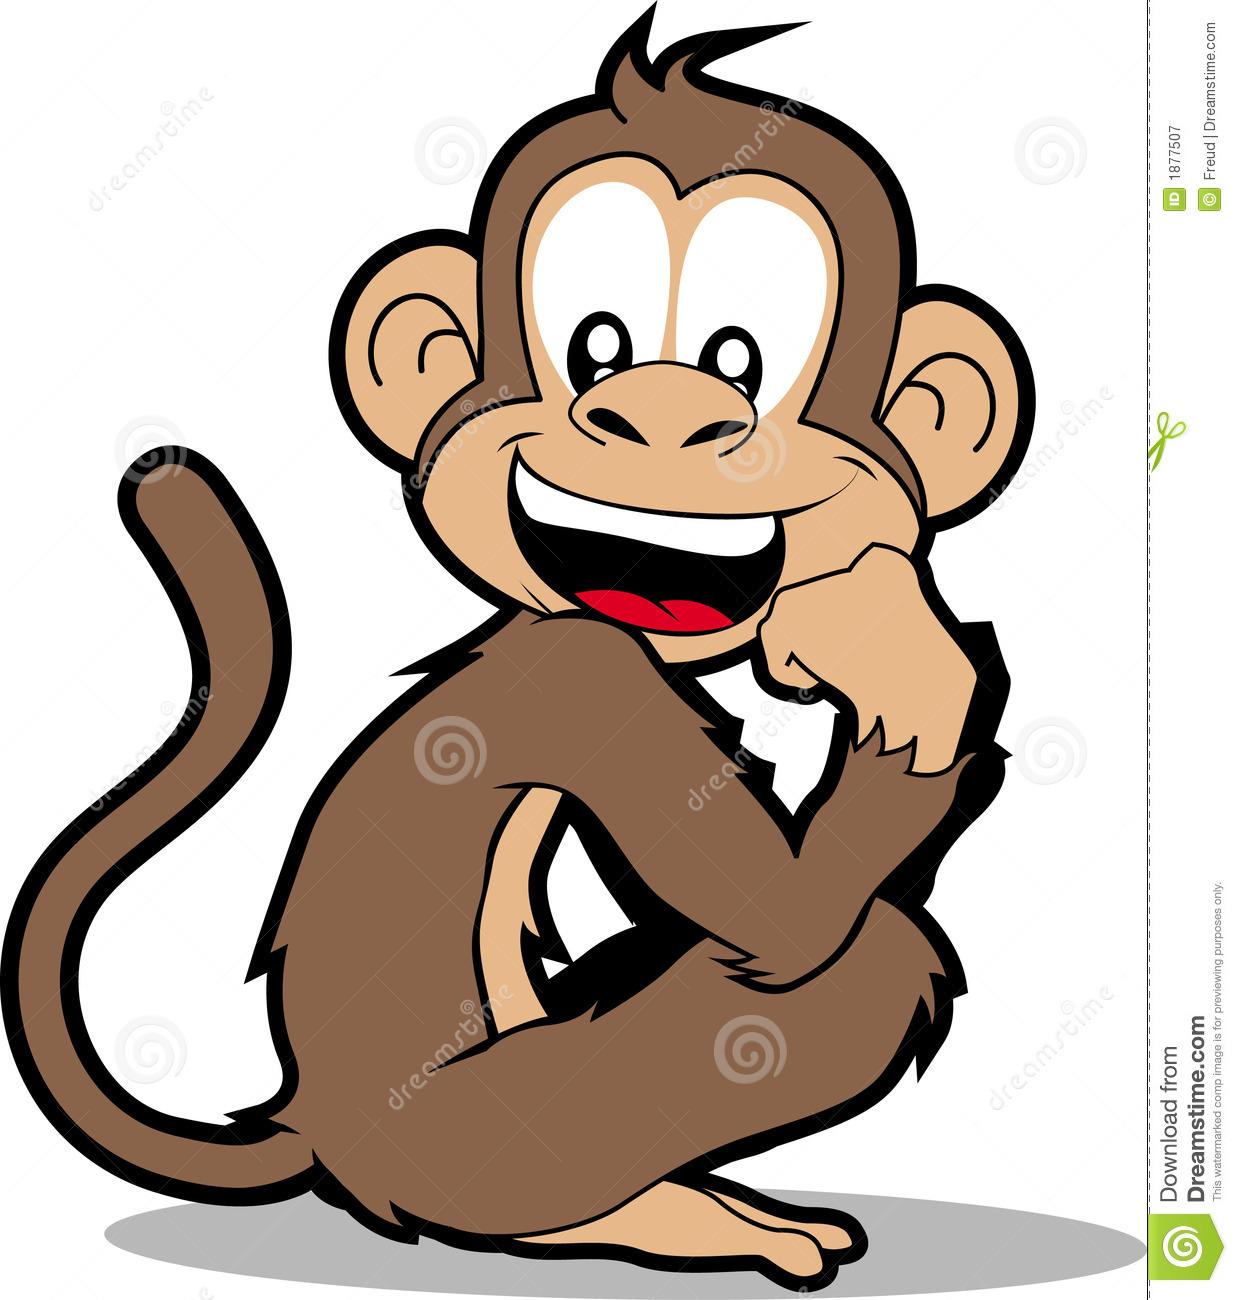 Monkey Stock Illustrations.